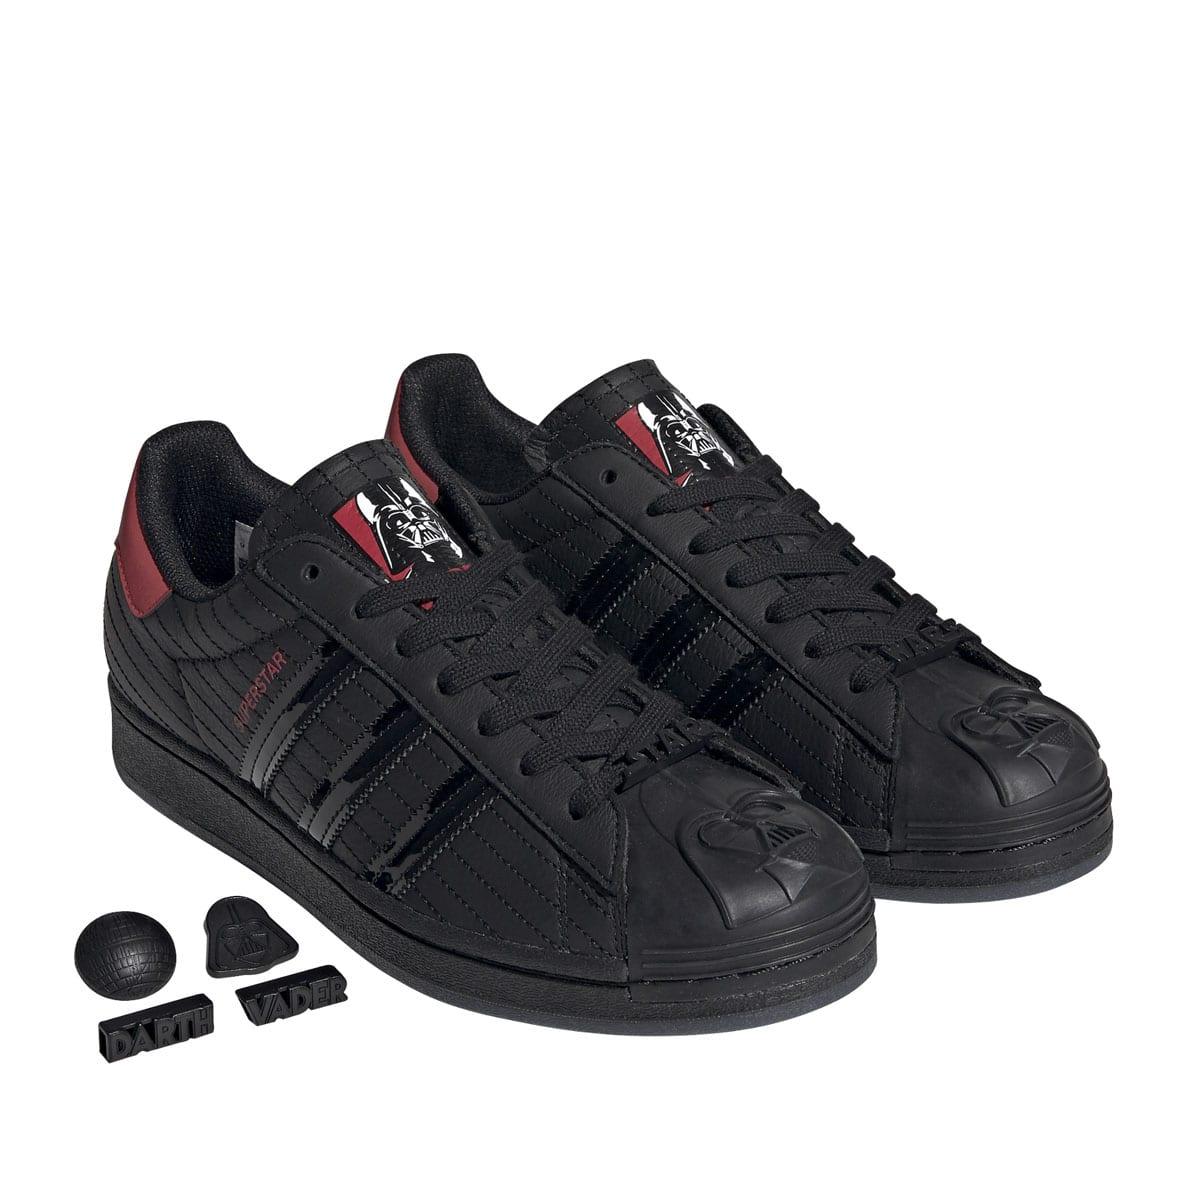 adidas x starwars SUPERSTAR DARTH VADER CORE BLACK/CORE BLACK/SCARLET 20SS-S_photo_large